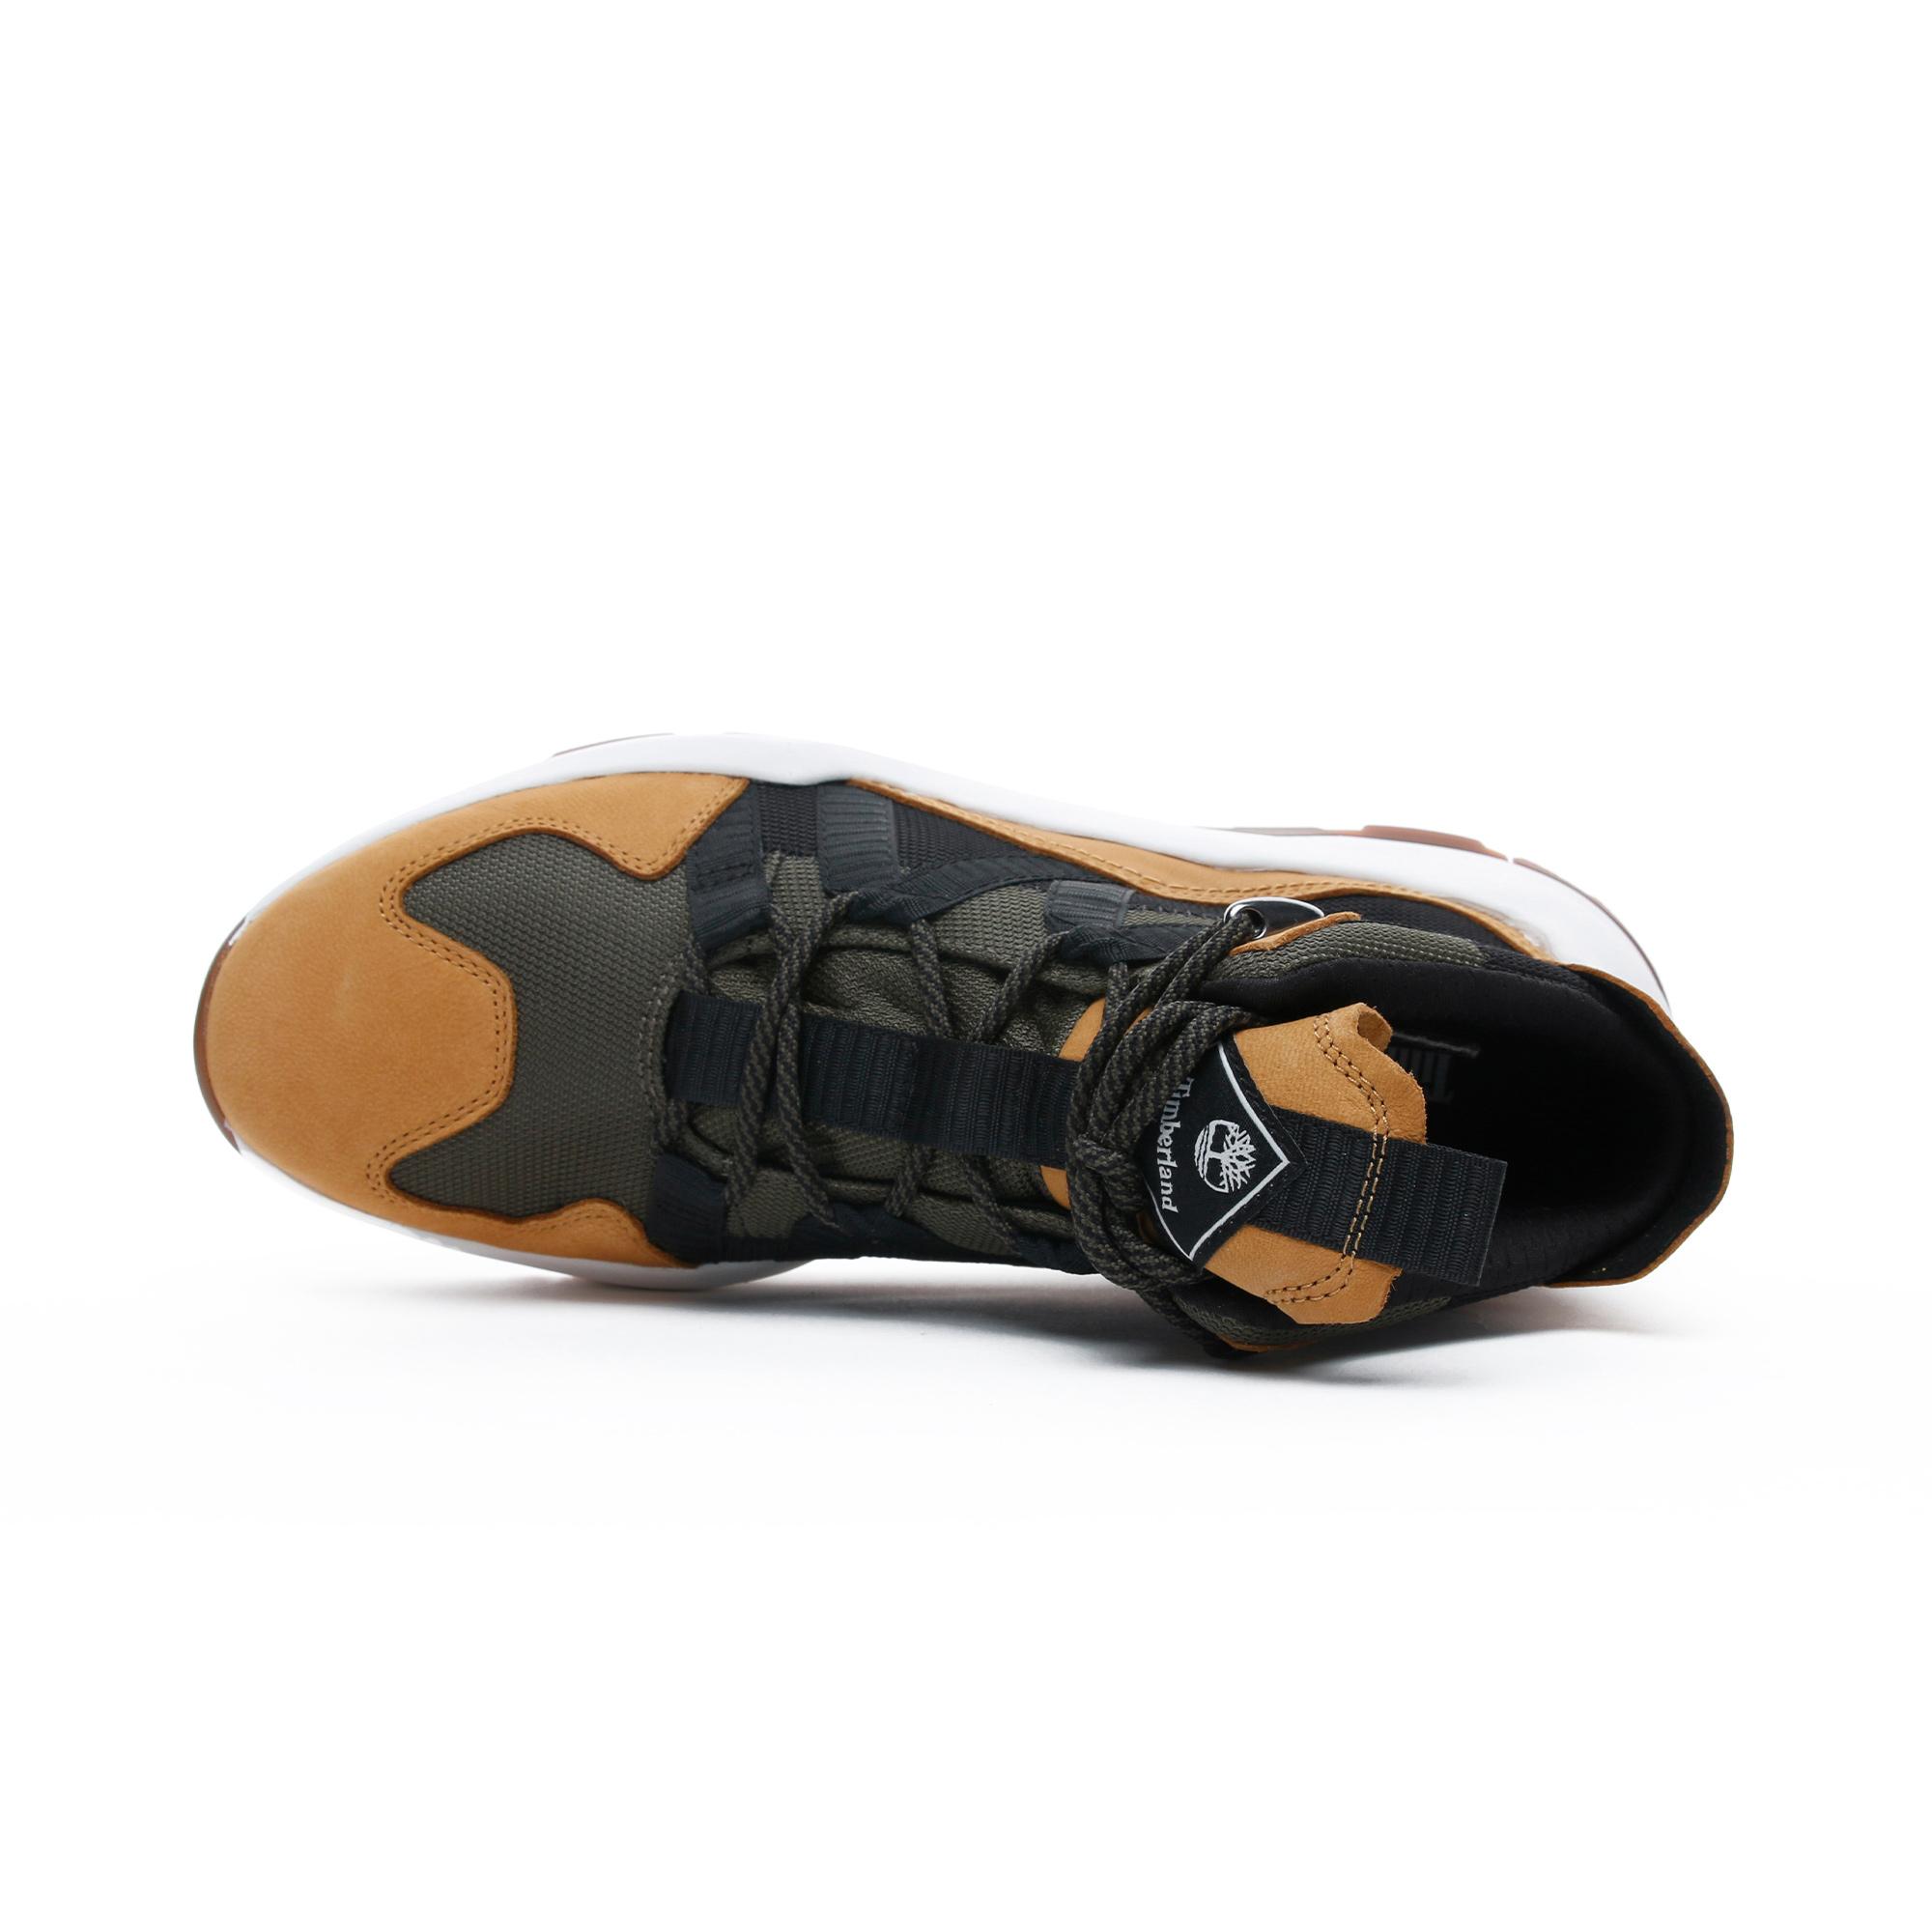 Timberland Madbury Hiker Erkek Kahverengi Spor Ayakkabı